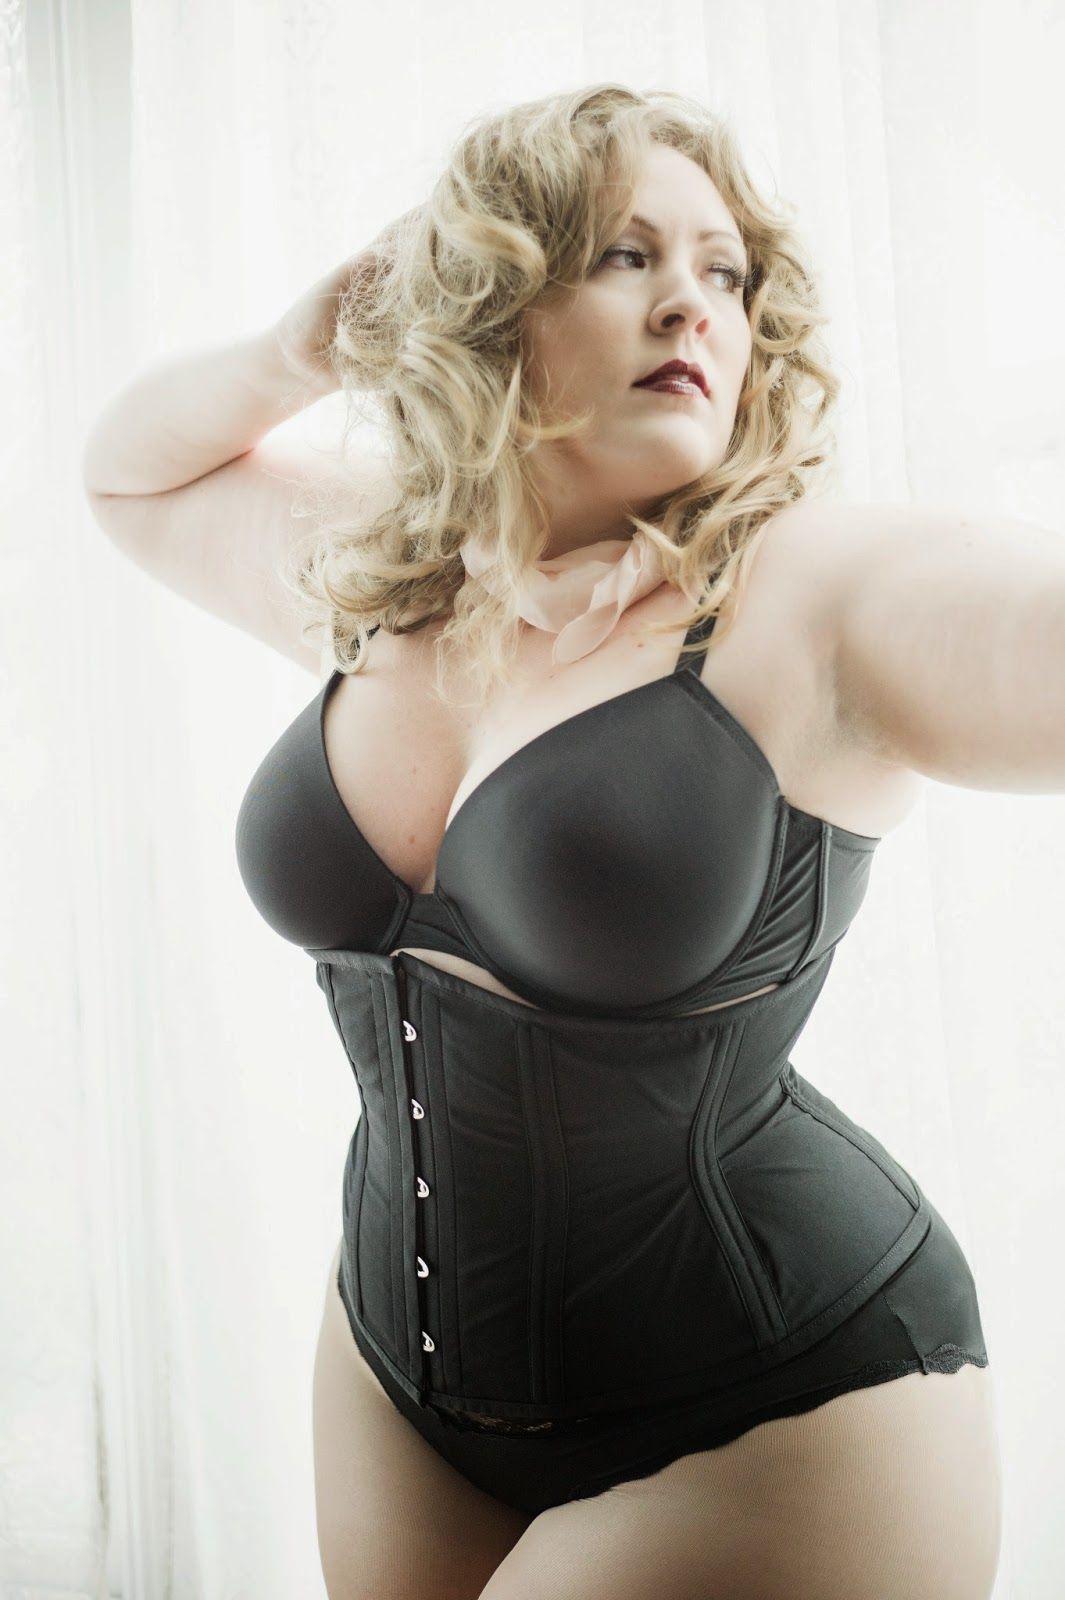 Sexy moms web cam